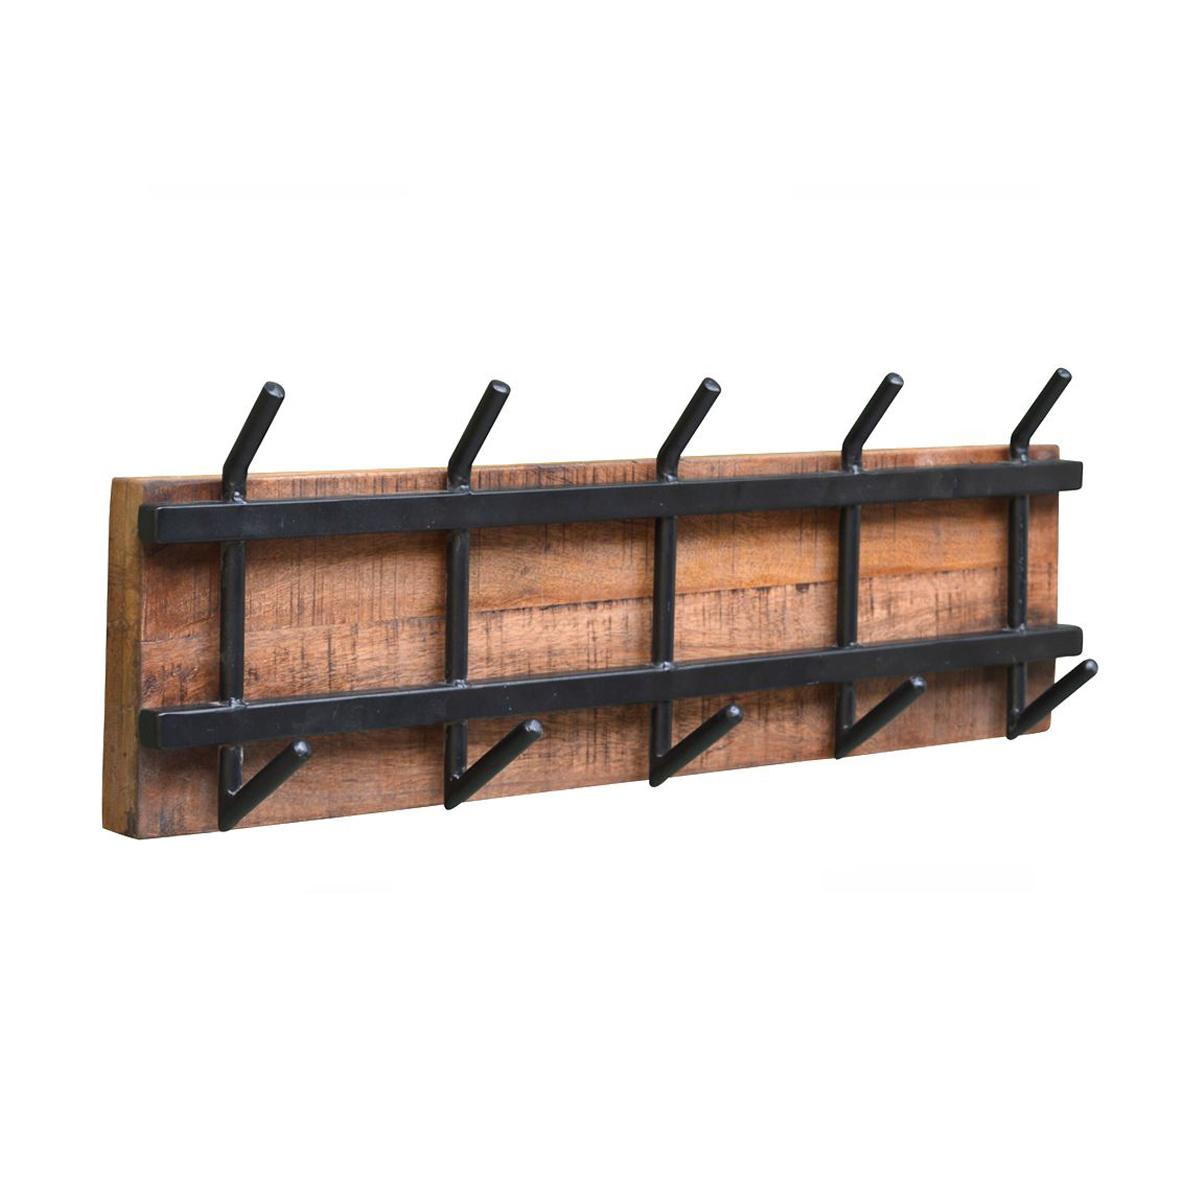 Wandkapstok hout met staal